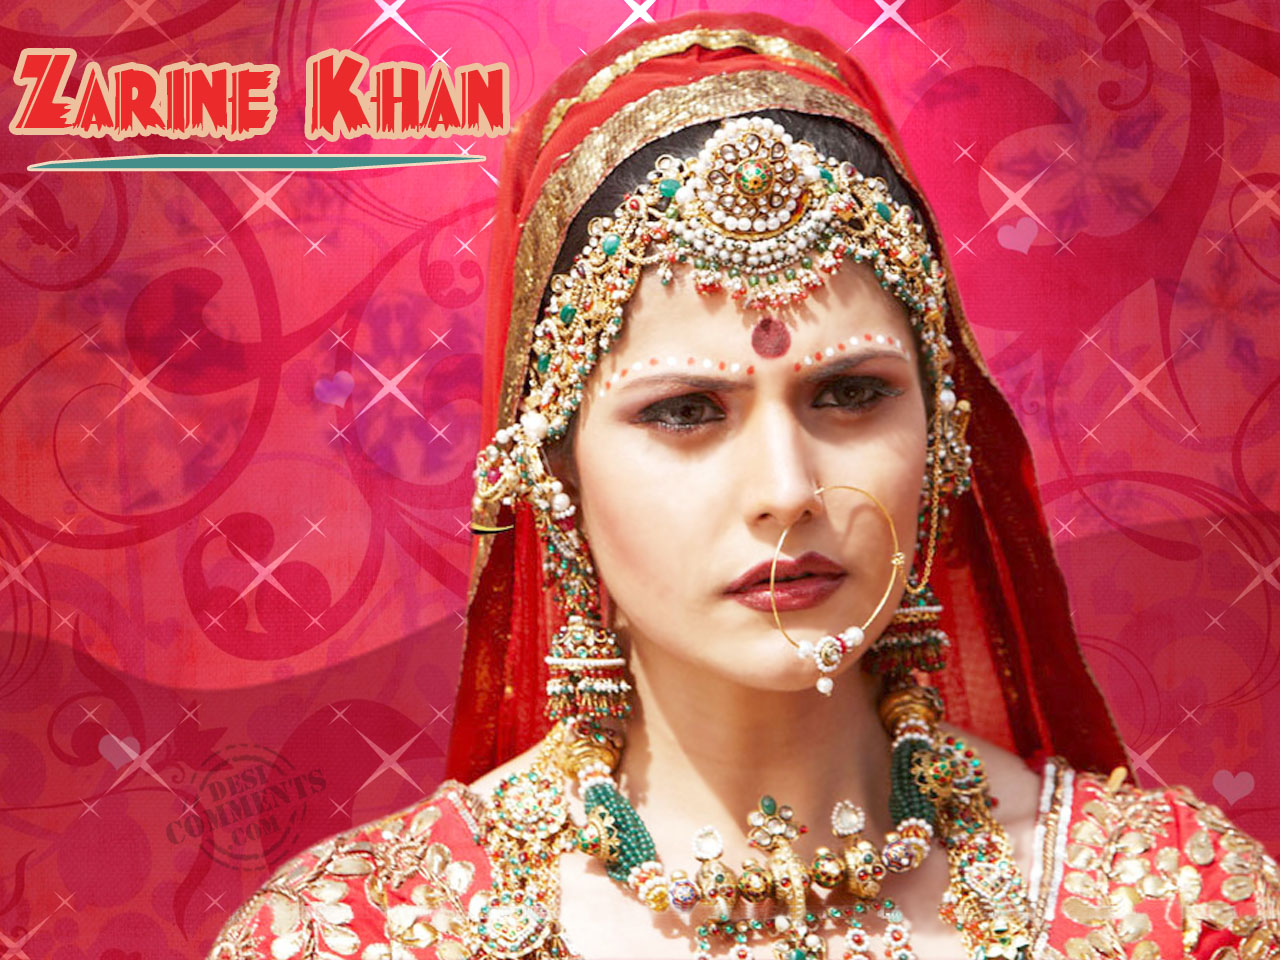 http://2.bp.blogspot.com/-jHaTJkQkbT0/Tm2YPPiKzkI/AAAAAAAAAK0/kJbZtO8KHtk/s1600/Zarine-Khan-Wallpaper-4.jpg